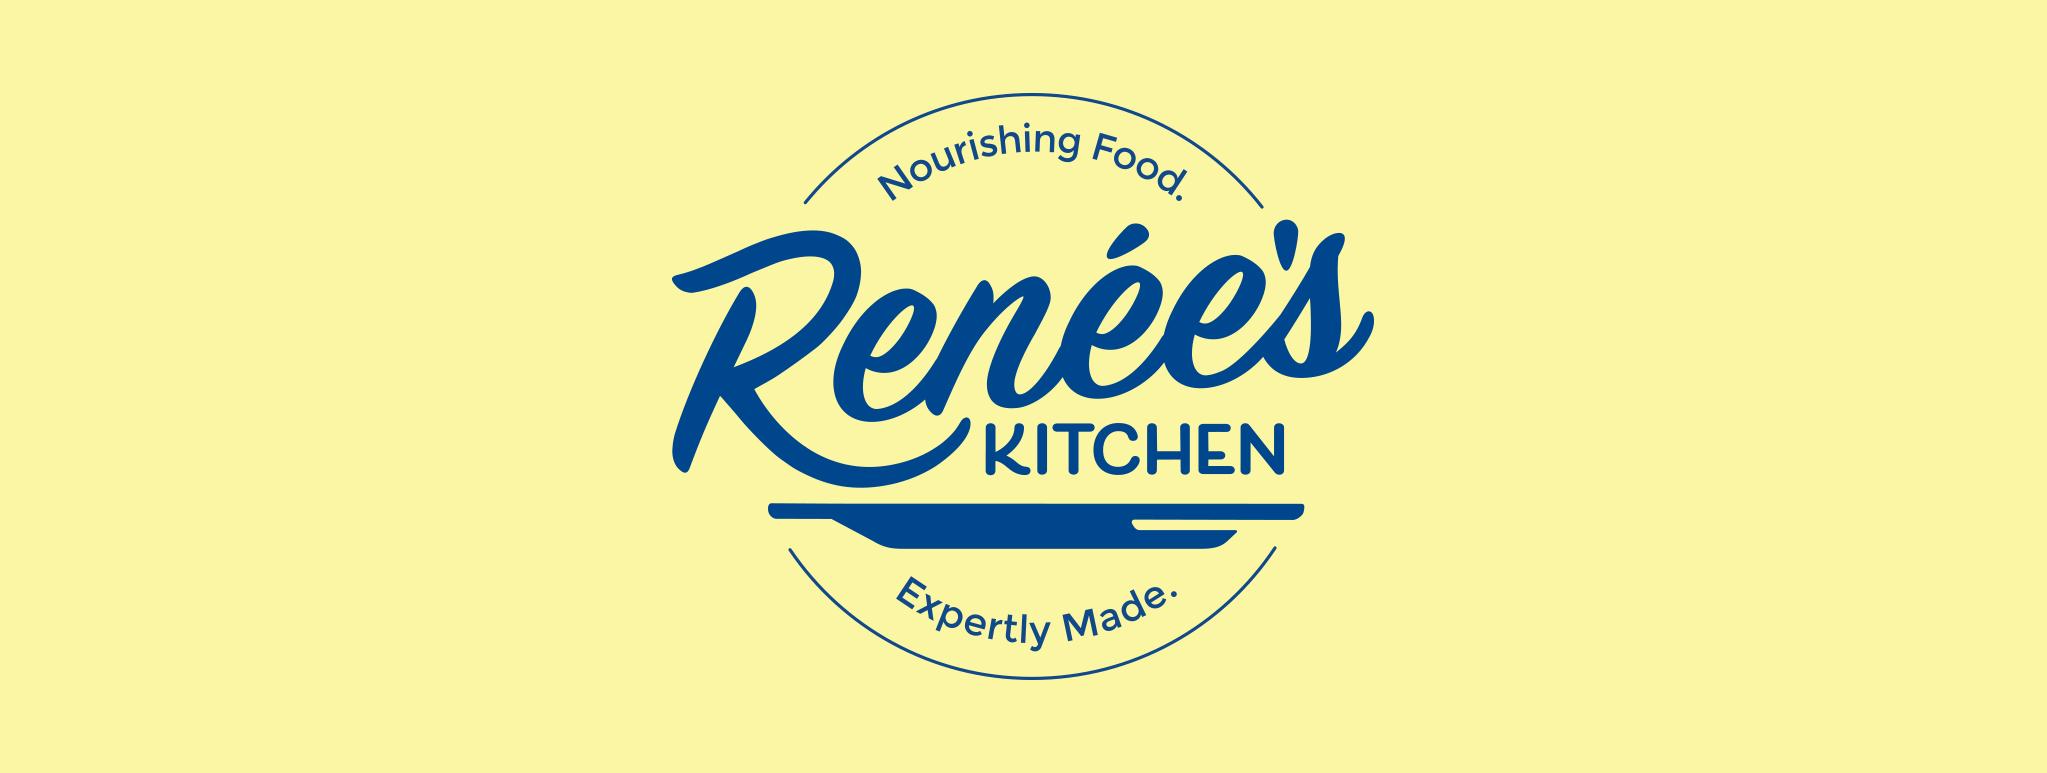 Rocketkoi ren e 39 s kitchen for Renee s kitchen